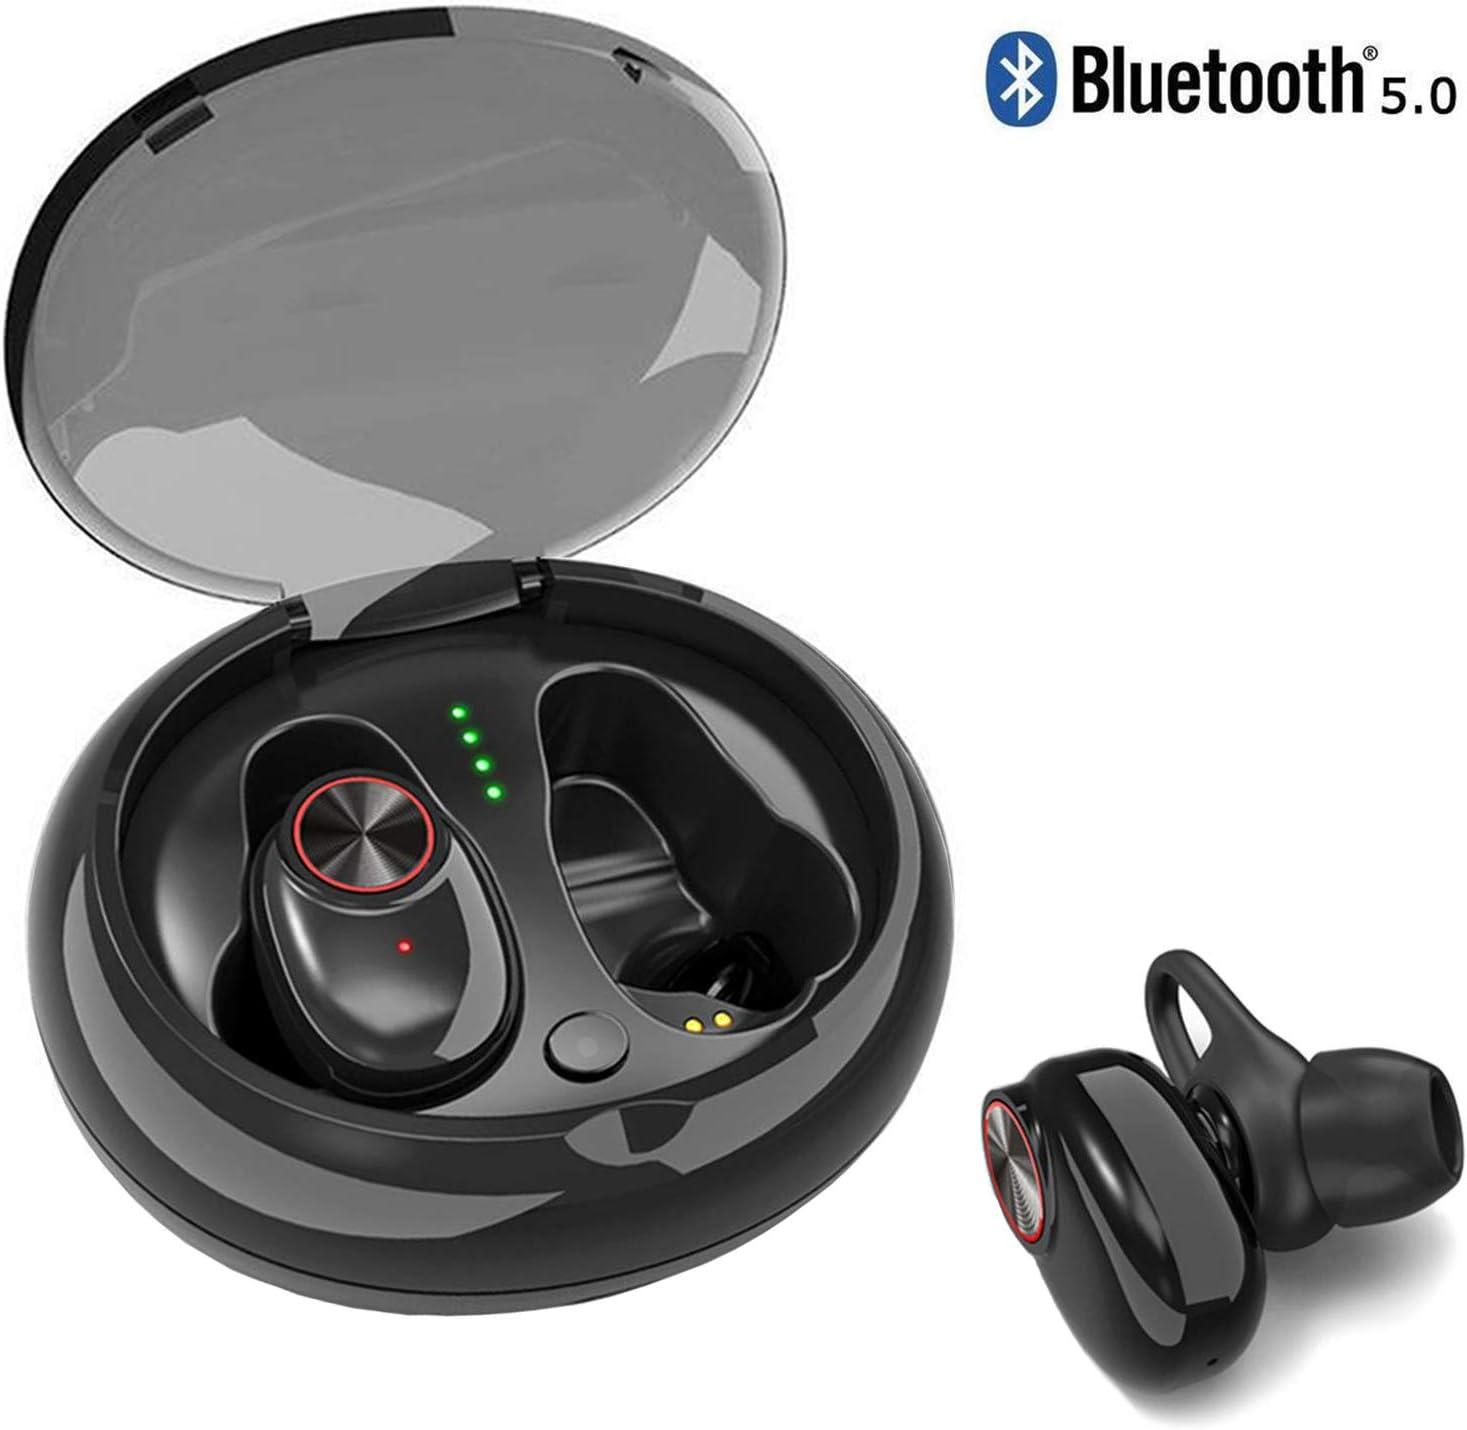 Bluetooth 5.0 Wireless Earbuds, ZACTEK TWS 3D Stereo Sound Earphones with Charging Case IPX6 Waterproof, Cordless Earbuds Sport Headphones for Running, Exercising. Black